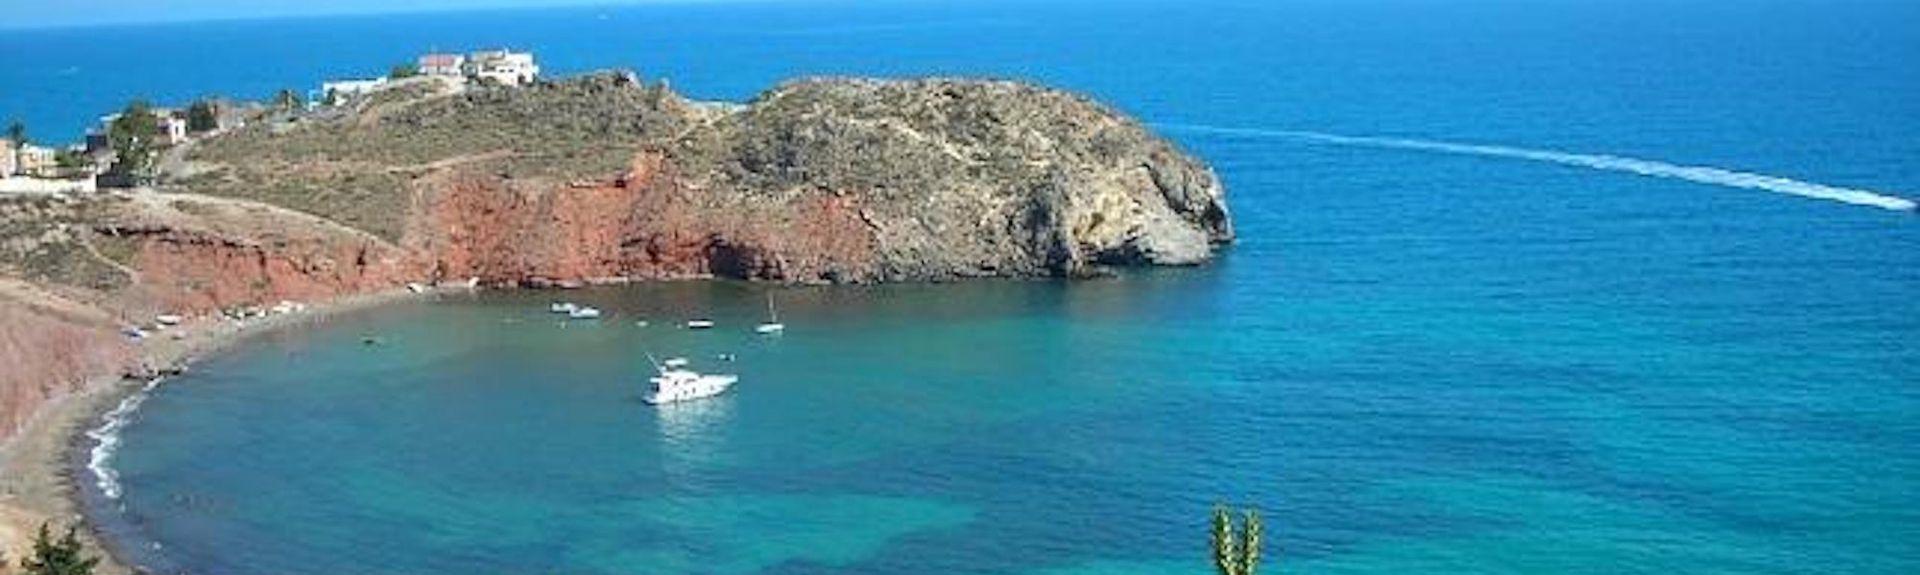 Las Terrazas de la Torre Golf Resort (Murcia, Spania)